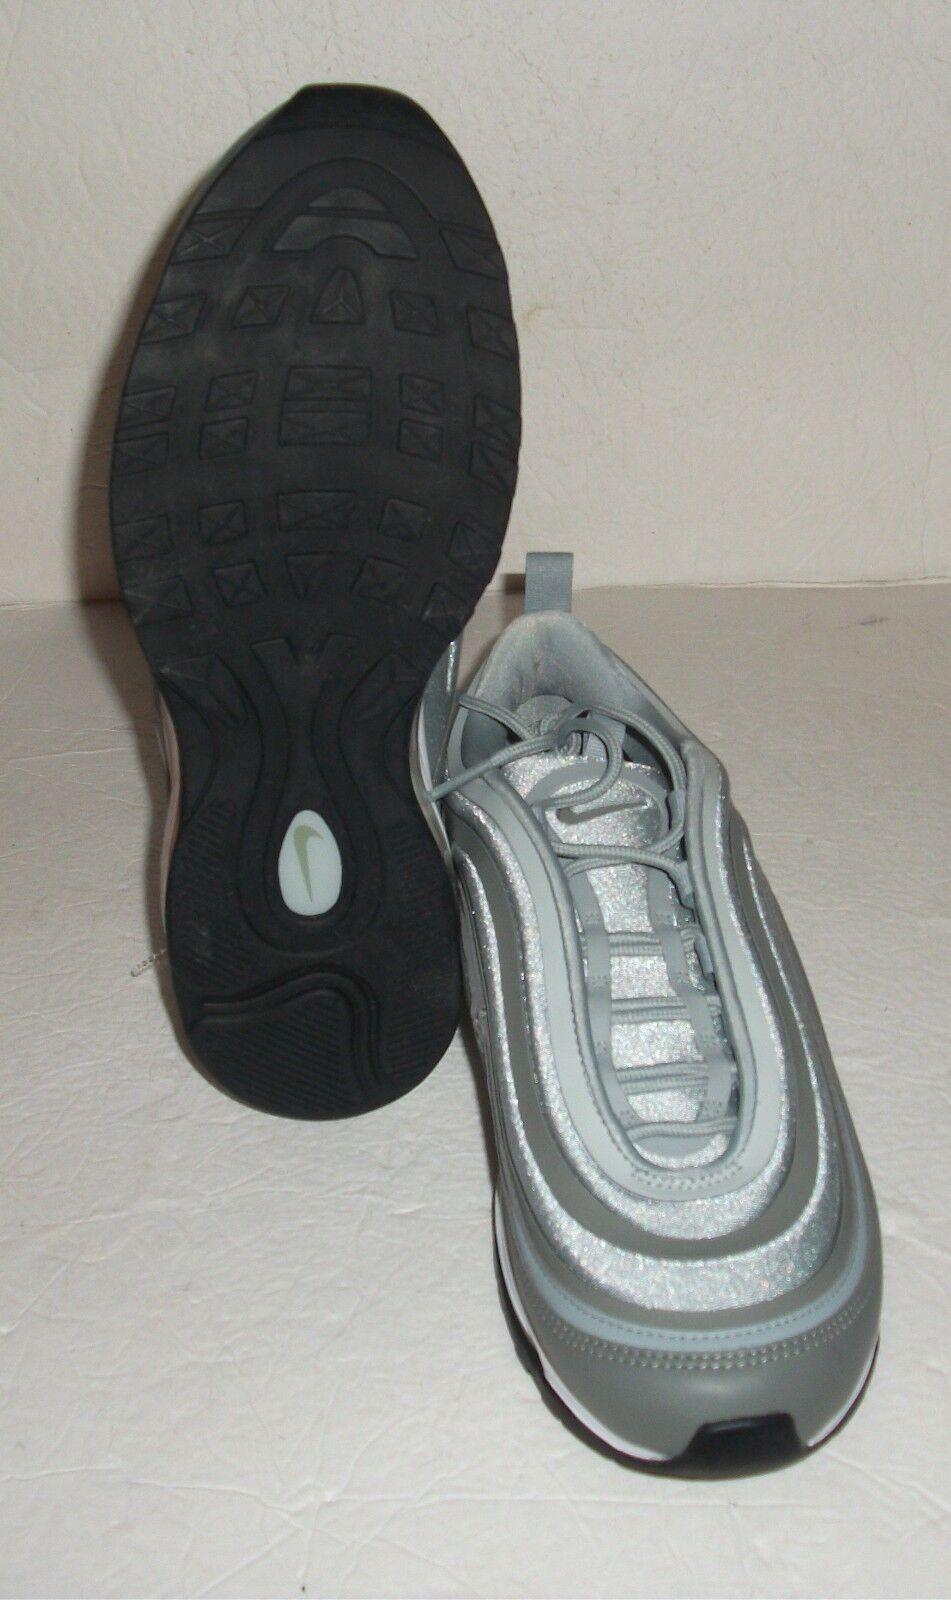 New Nike Air Max 97 Ultra Ultra Ultra '17, Women's Size 10.5, Grey Green, 917704-004 5bc24e